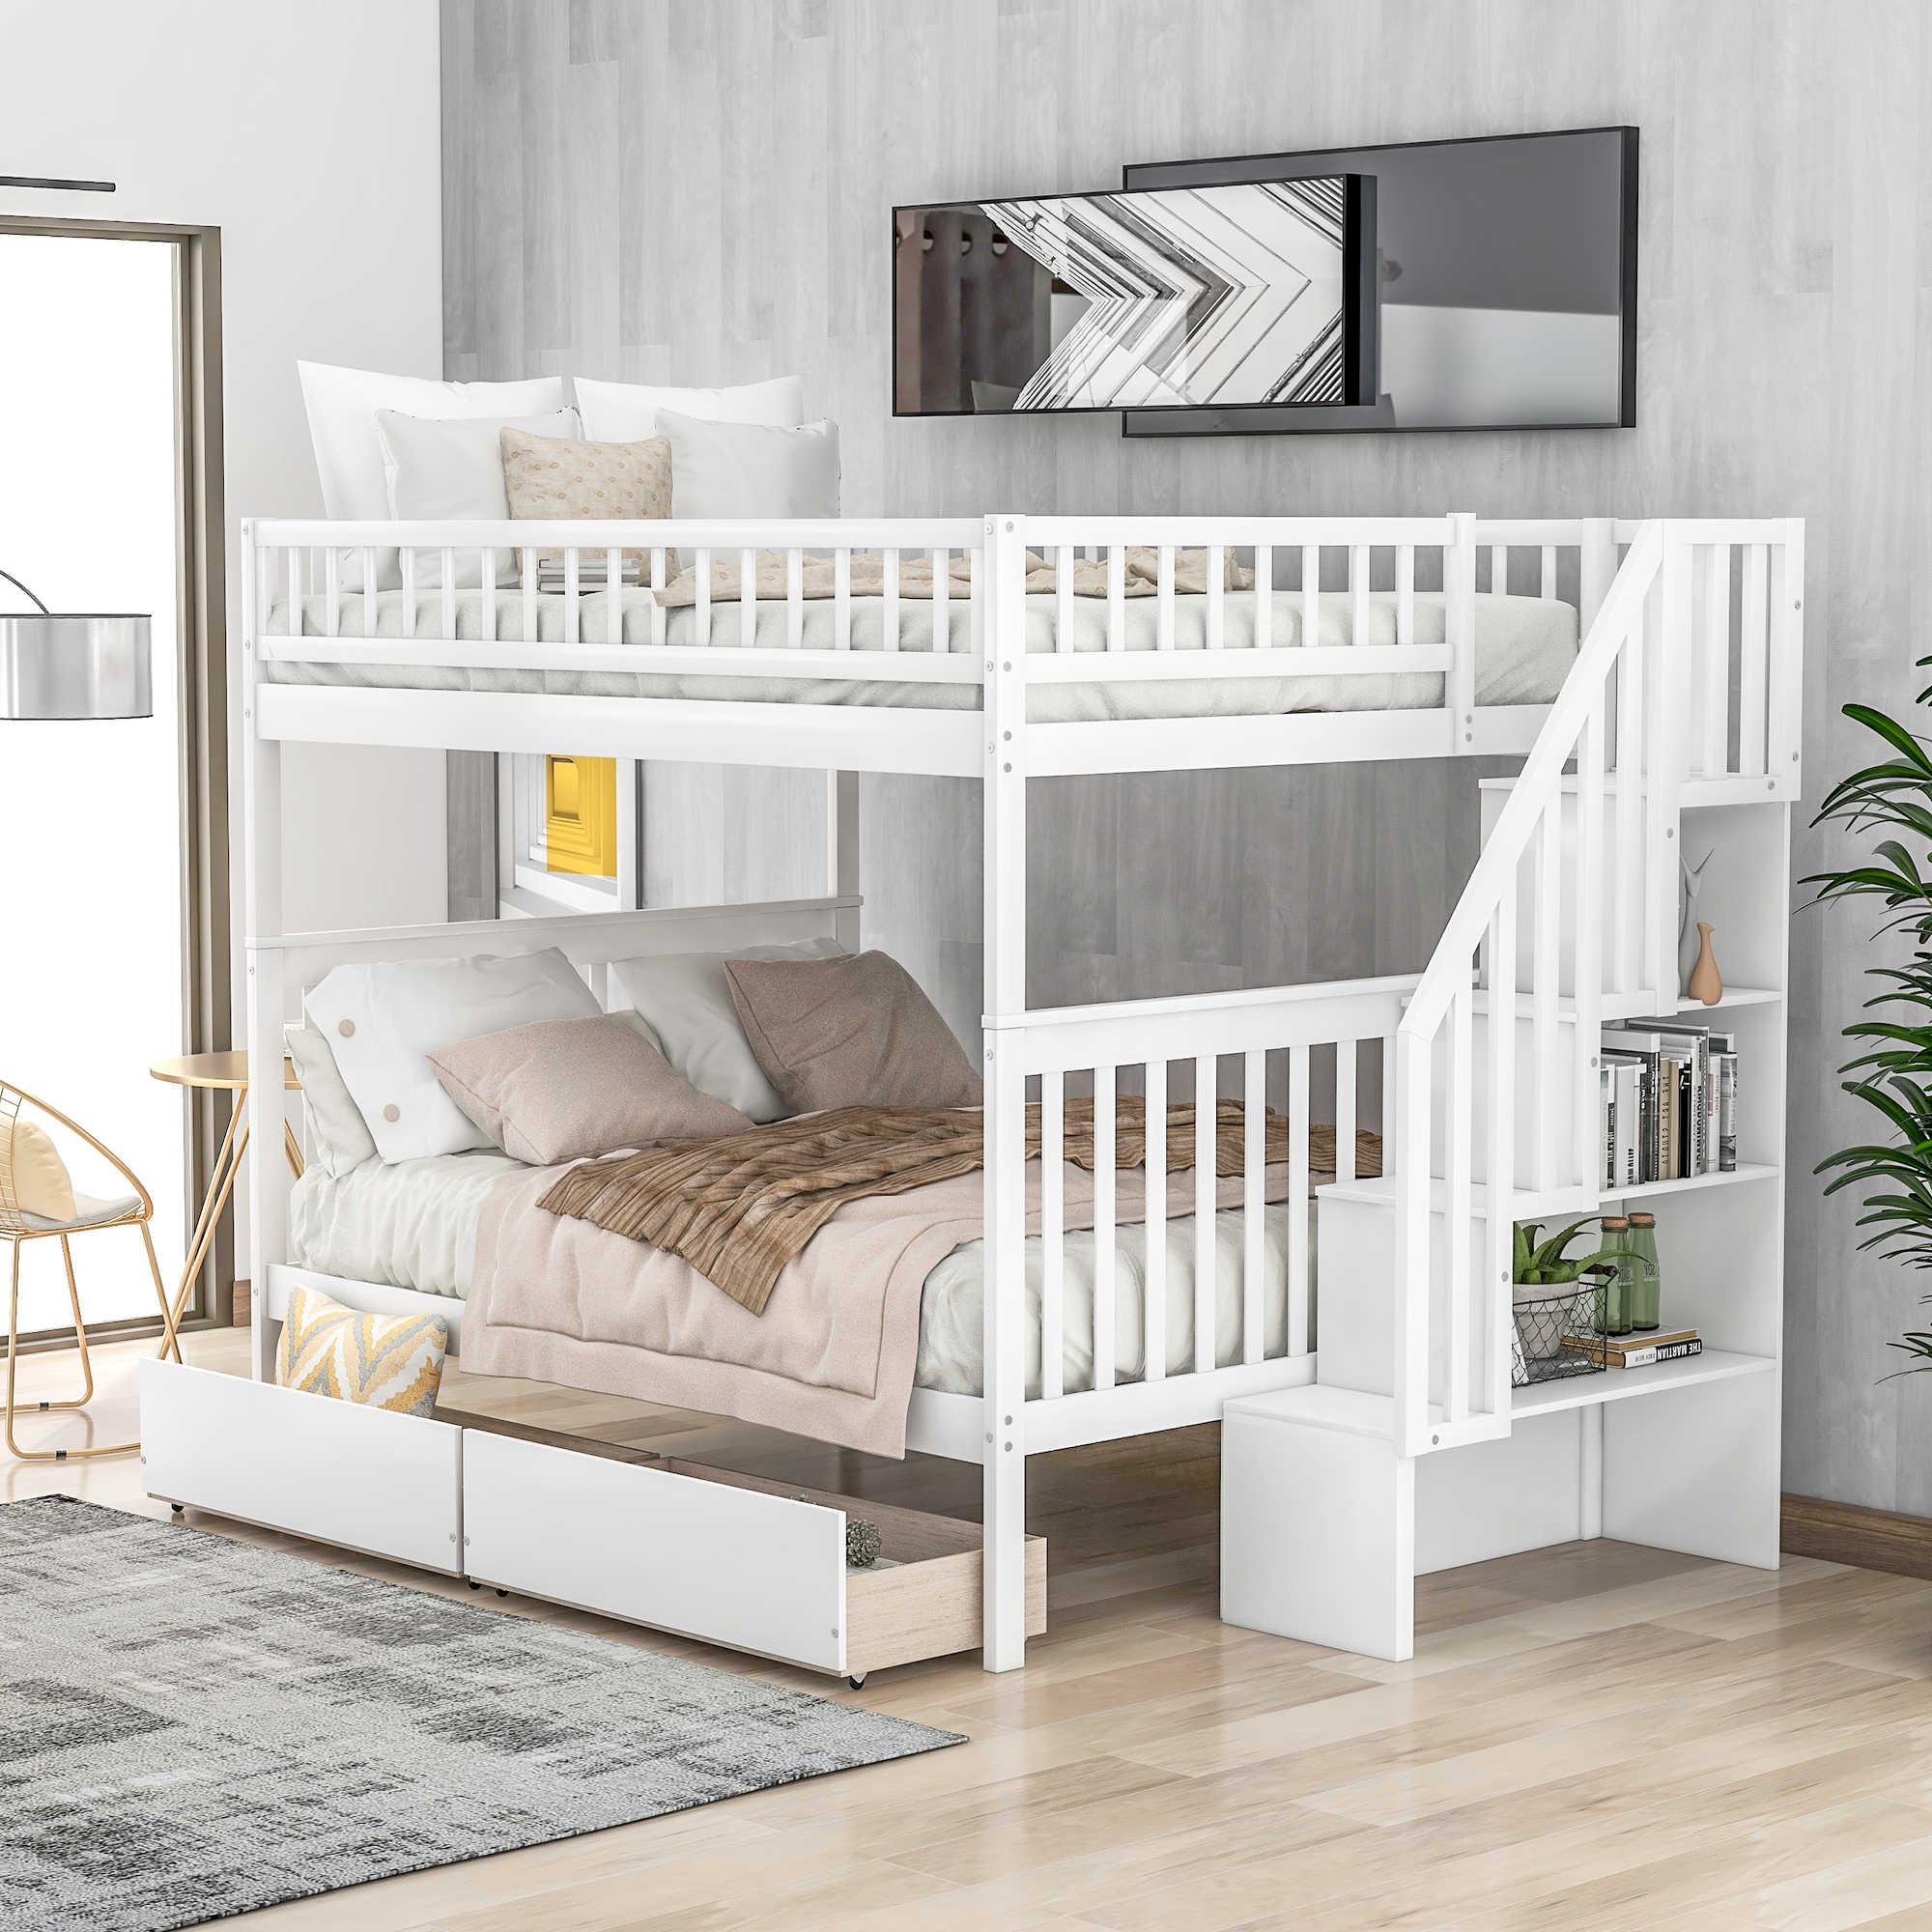 Modern Space Saving Kids Bedroom Furniture Set Pink Princess Twin Loft Bunk Beds With Desk And Wardrobe Bunk Bed Set Bedroom Sets Aliexpress